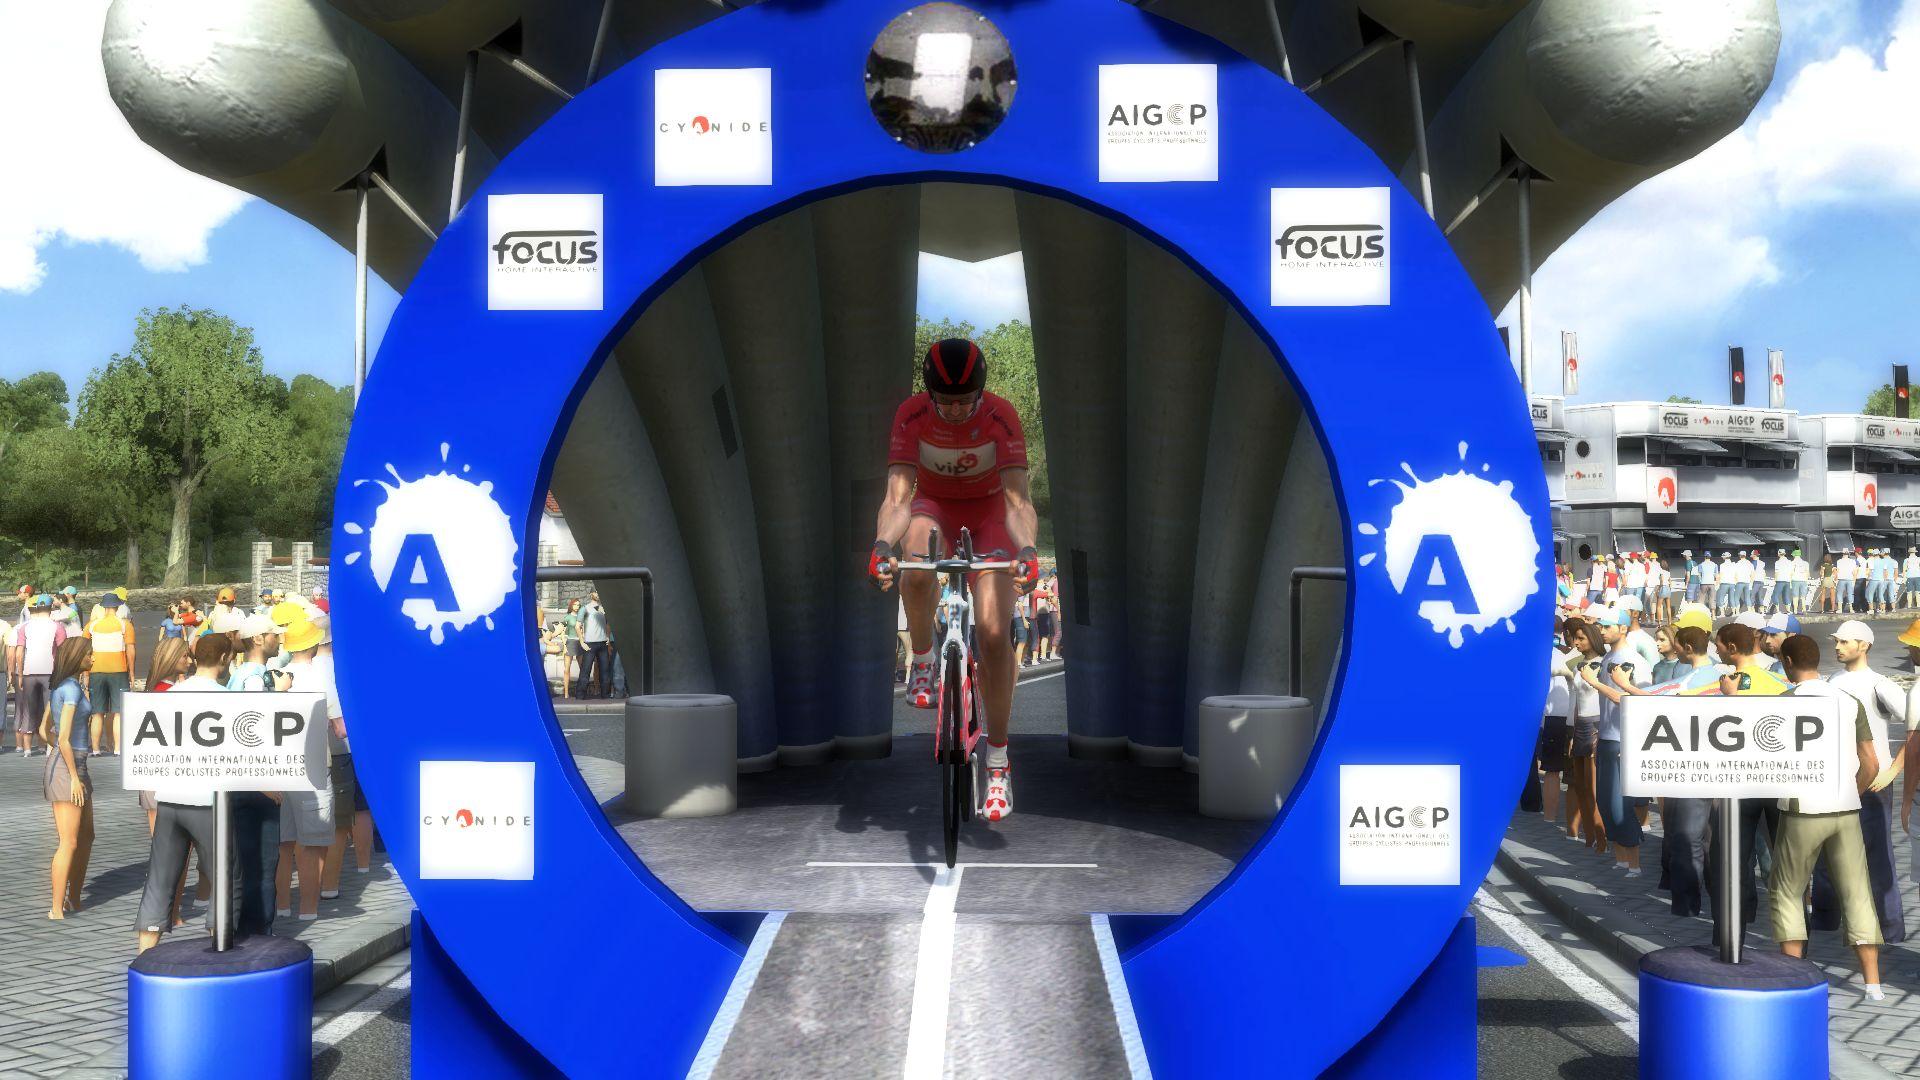 pcmdaily.com/images/mg/2019/Races/C1/Bayern/S4/mg19_bay_s04_01.jpg